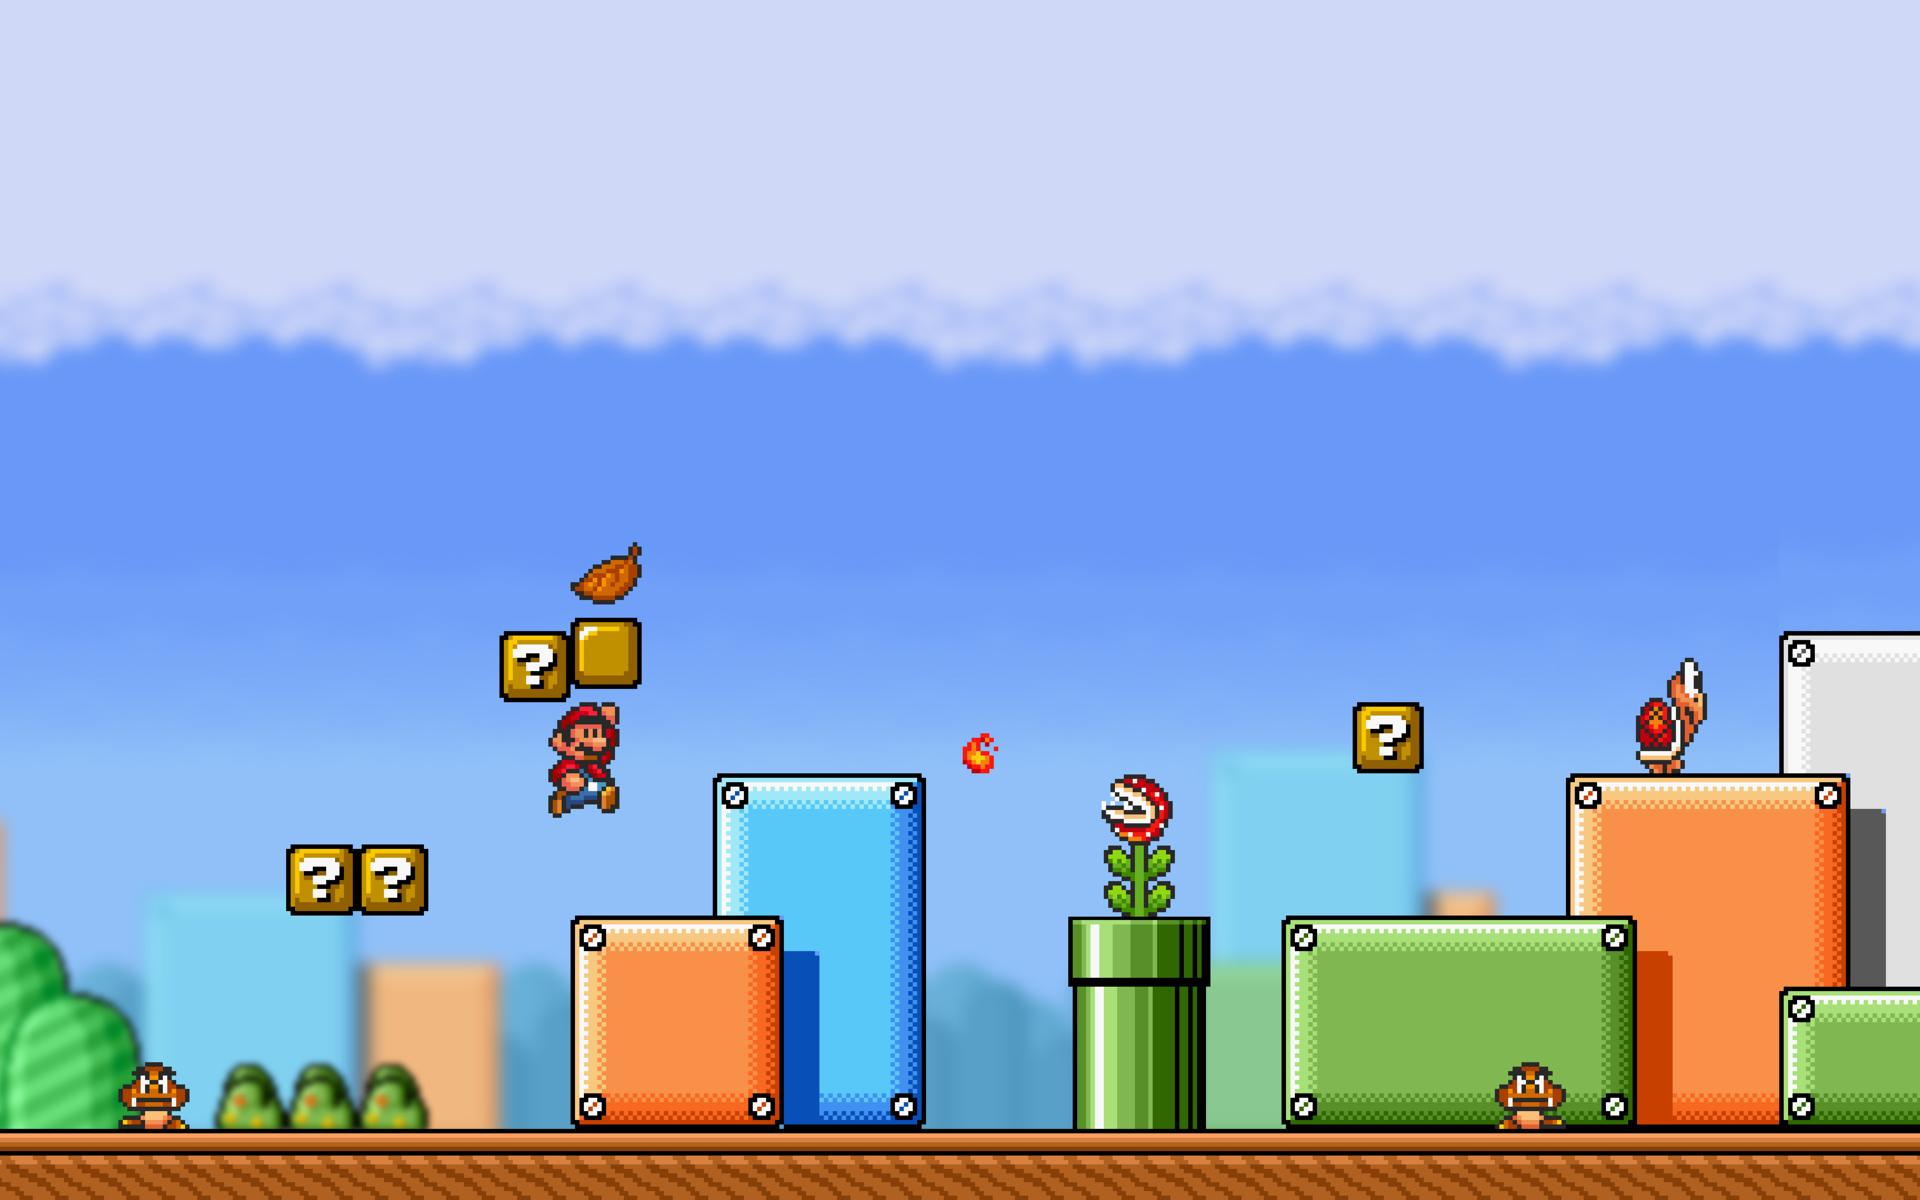 mario-game-hd-f9.jpg